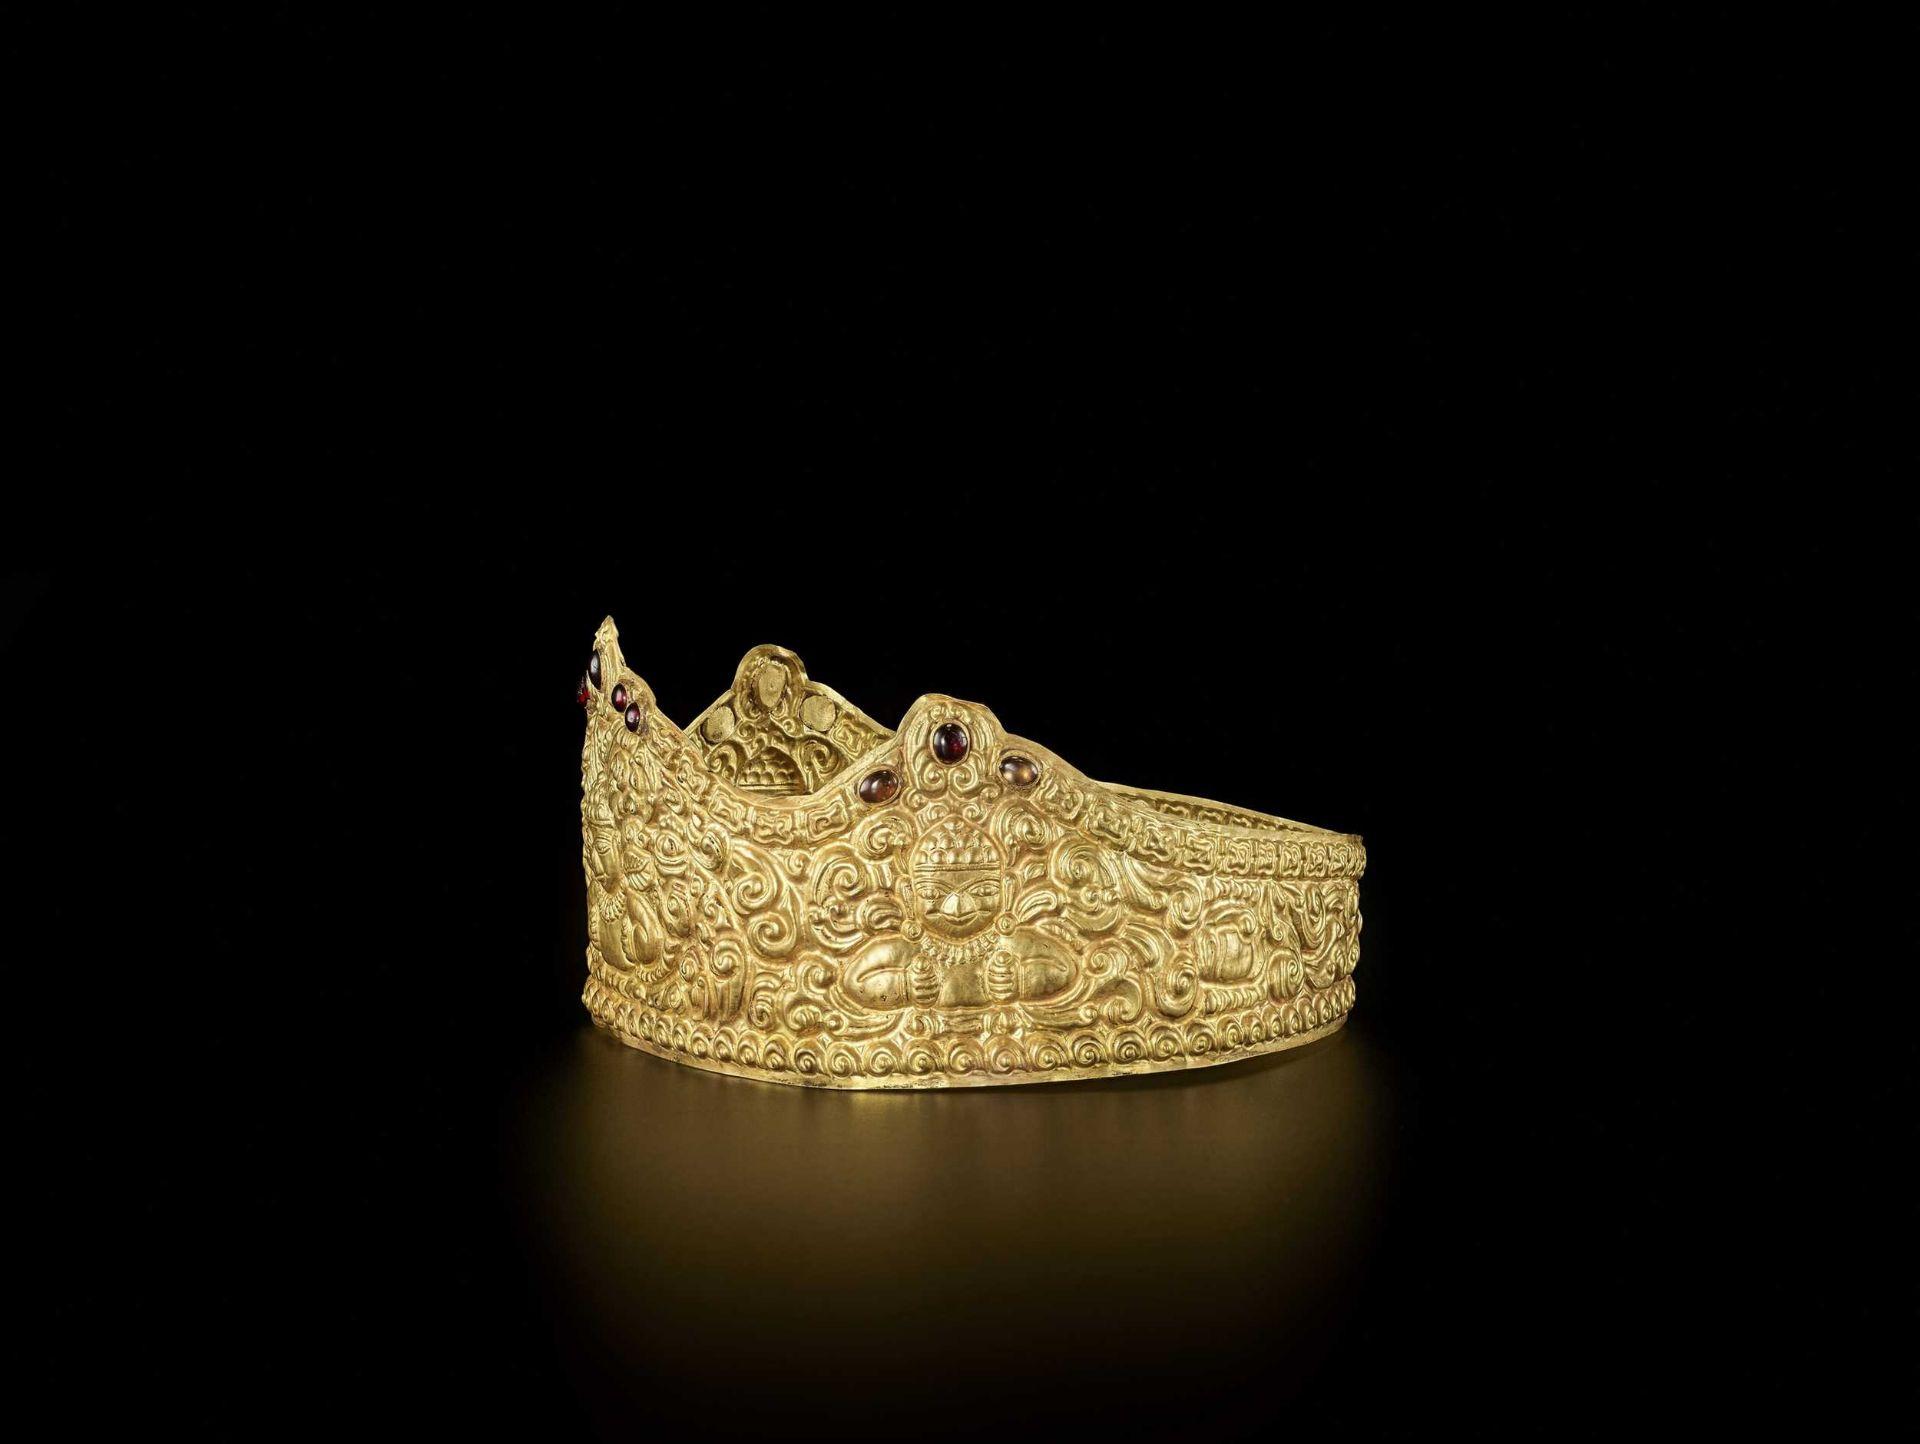 AN EXTRE MELY RARE AND FINE CHAM GEMSTONE-SET GOLD REPOUSSÉ CROWN WITH GARUDAS - Bild 5 aus 9